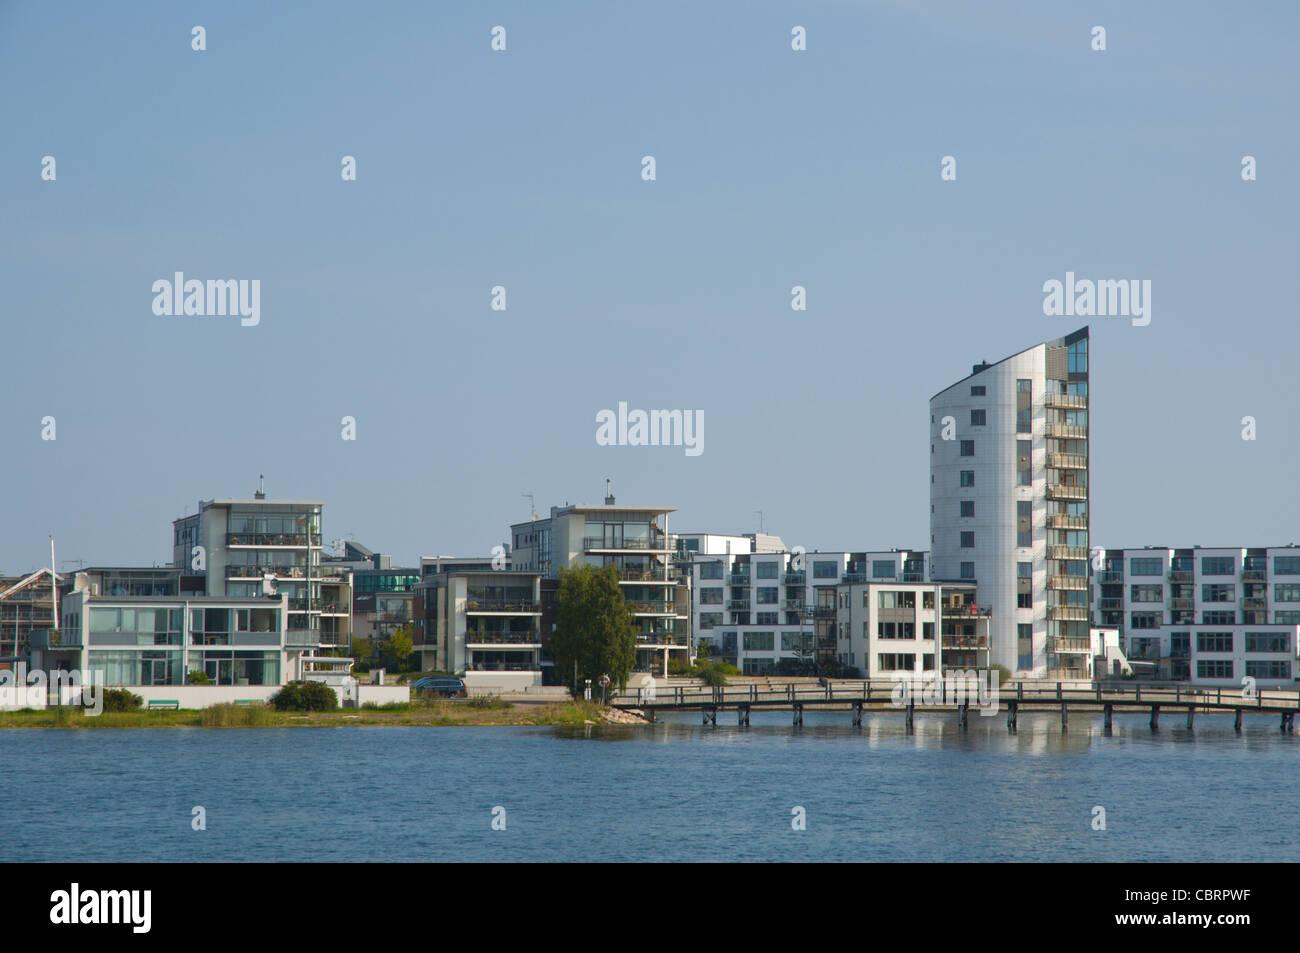 New residential buildings Ängö district Kalmar city Småland southern Sweden Europe - Stock Image